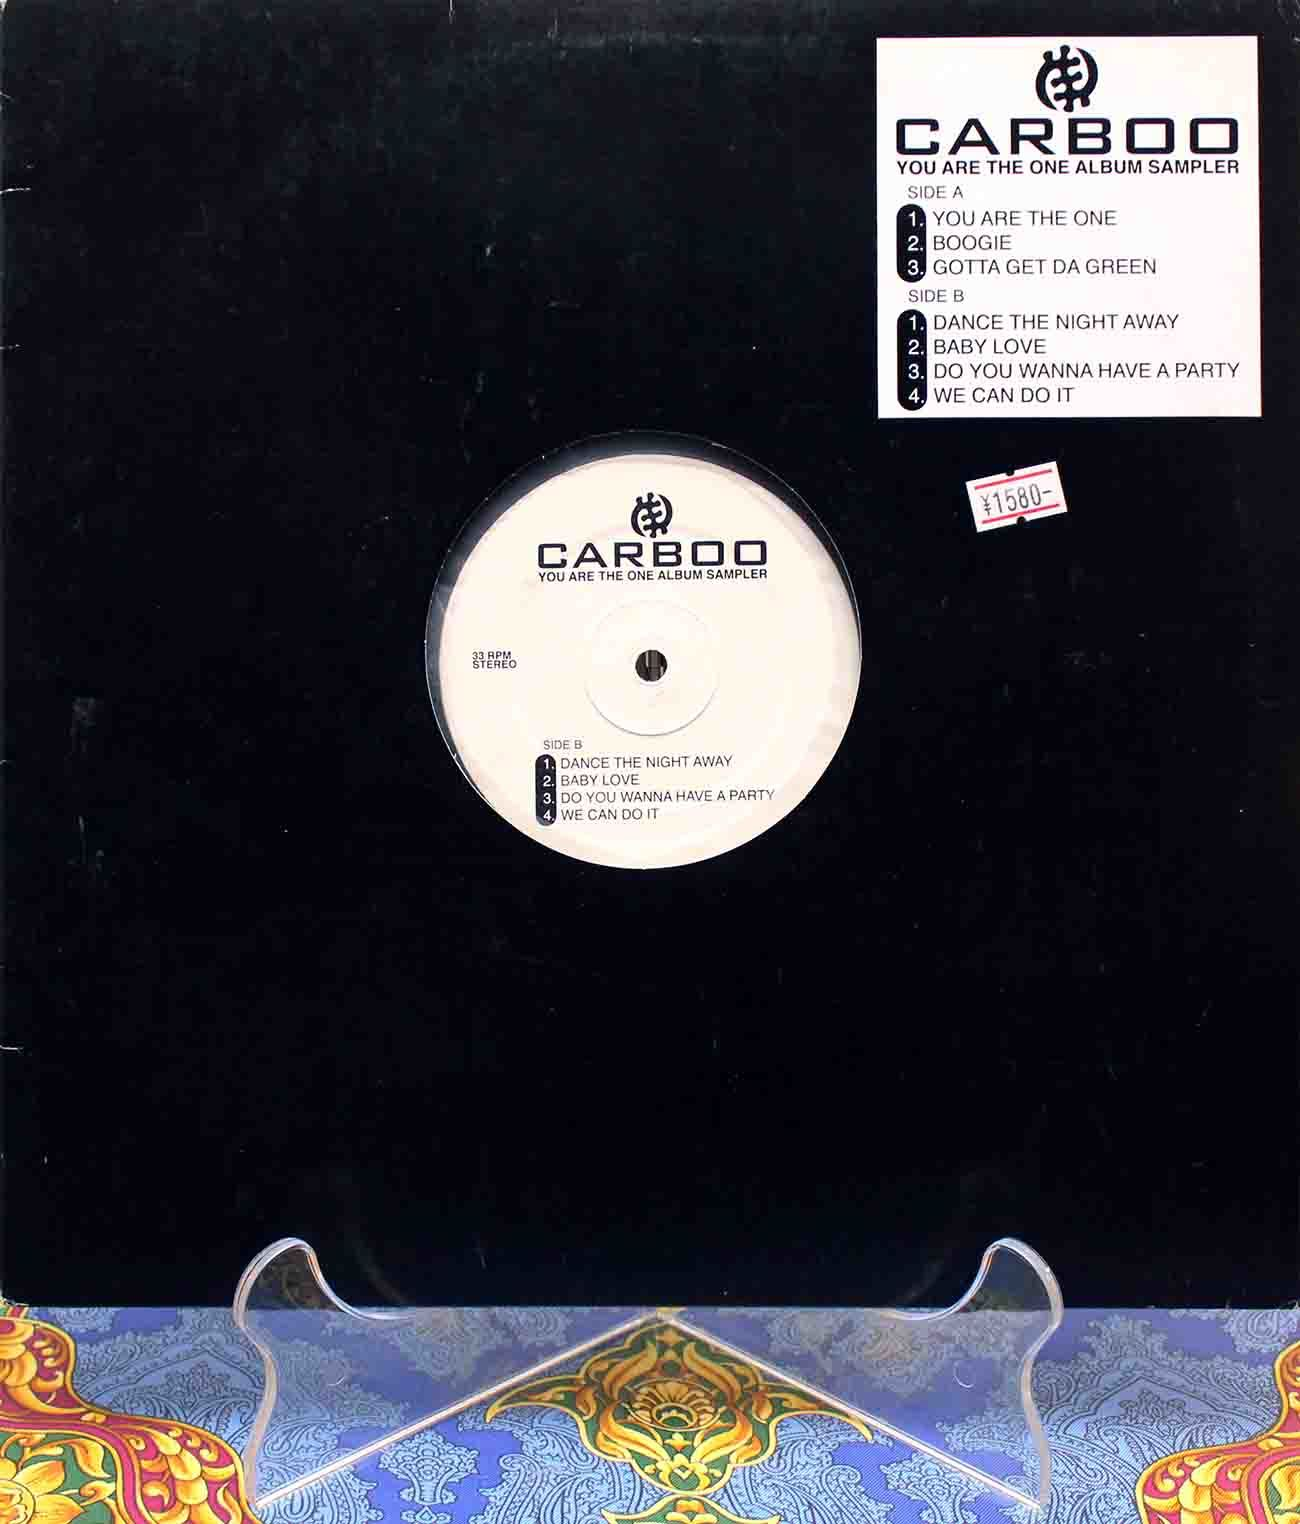 carboo Promo 12 02